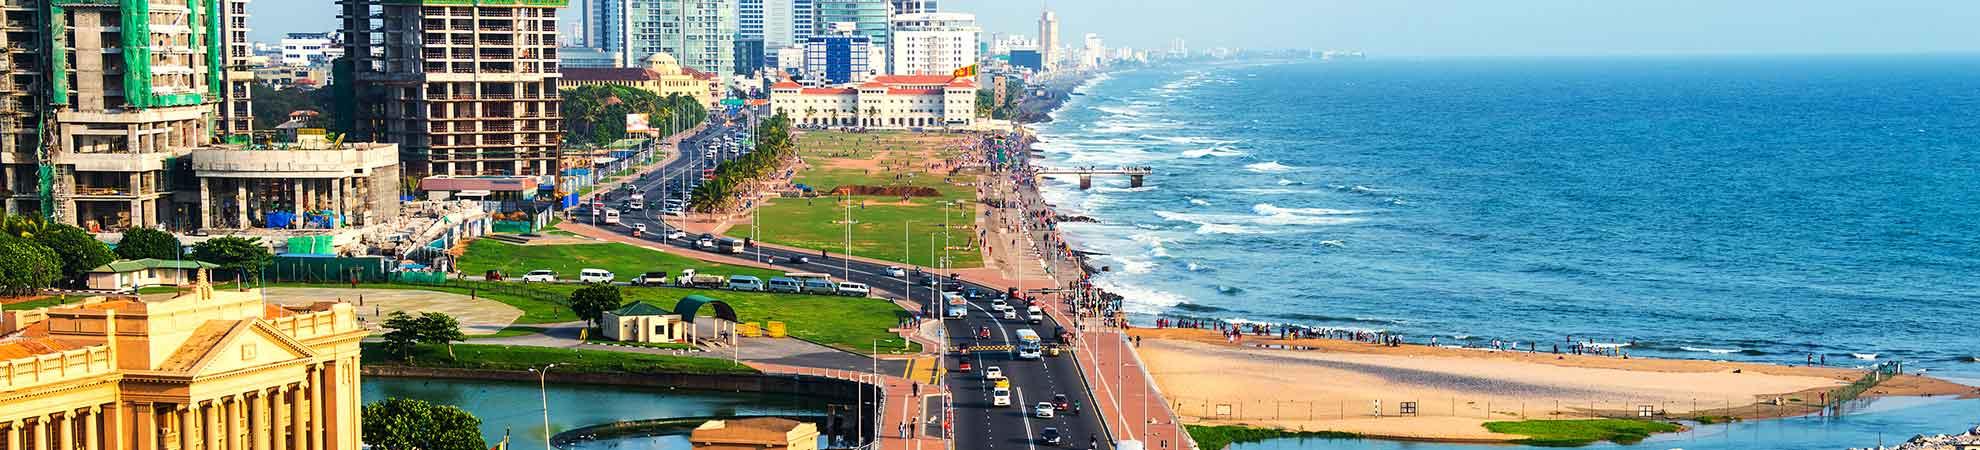 Adresses utiles pour le Sri Lanka